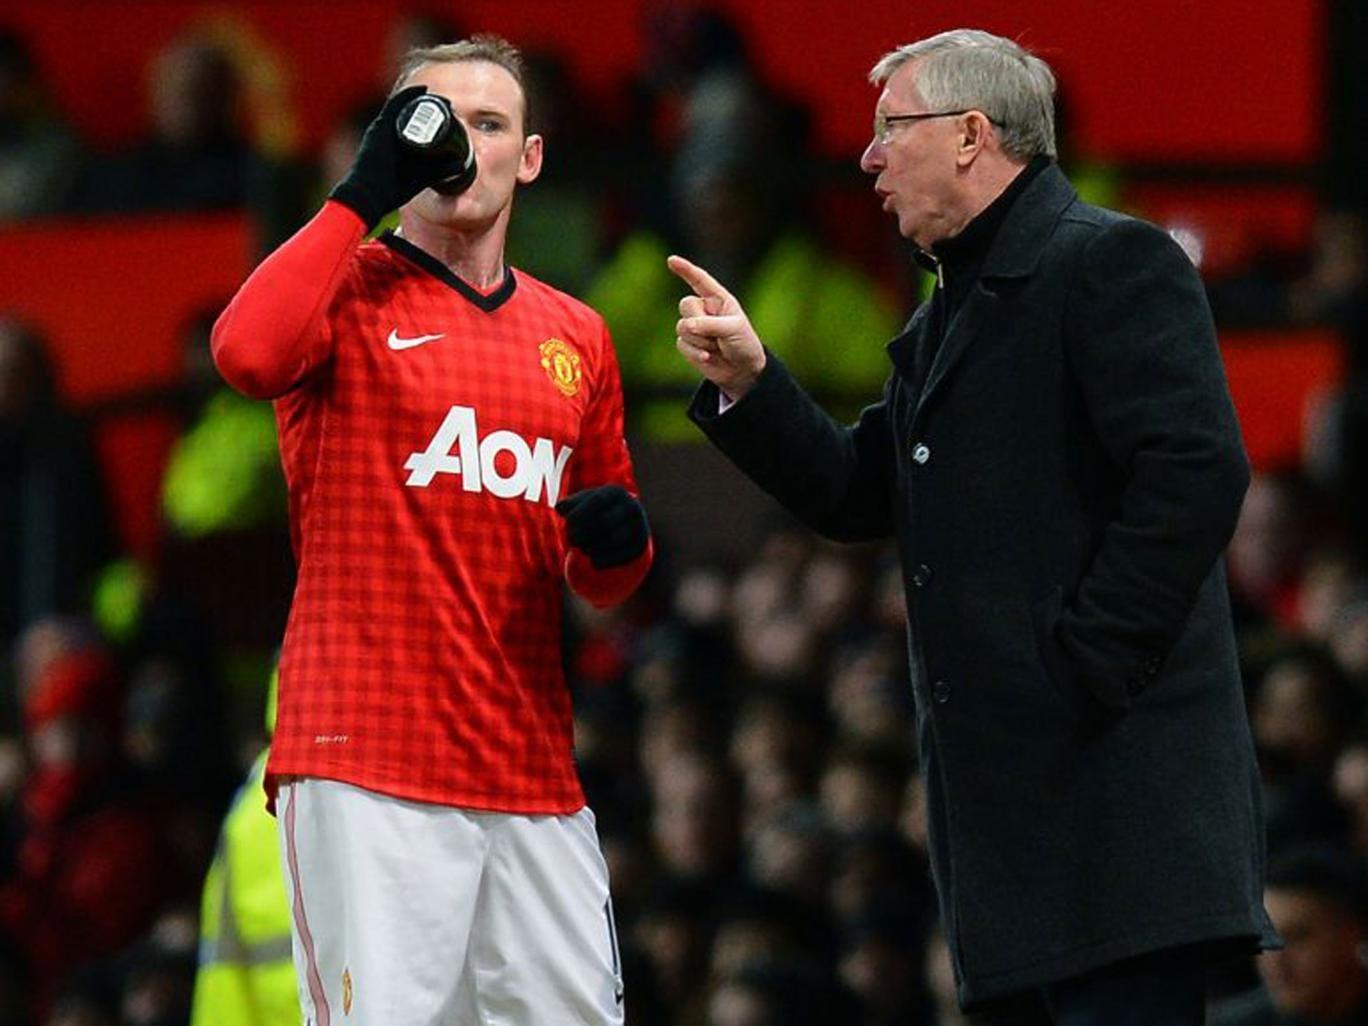 Sir Alex Ferguson (right) said Wayne Rooney had asked for a transfer